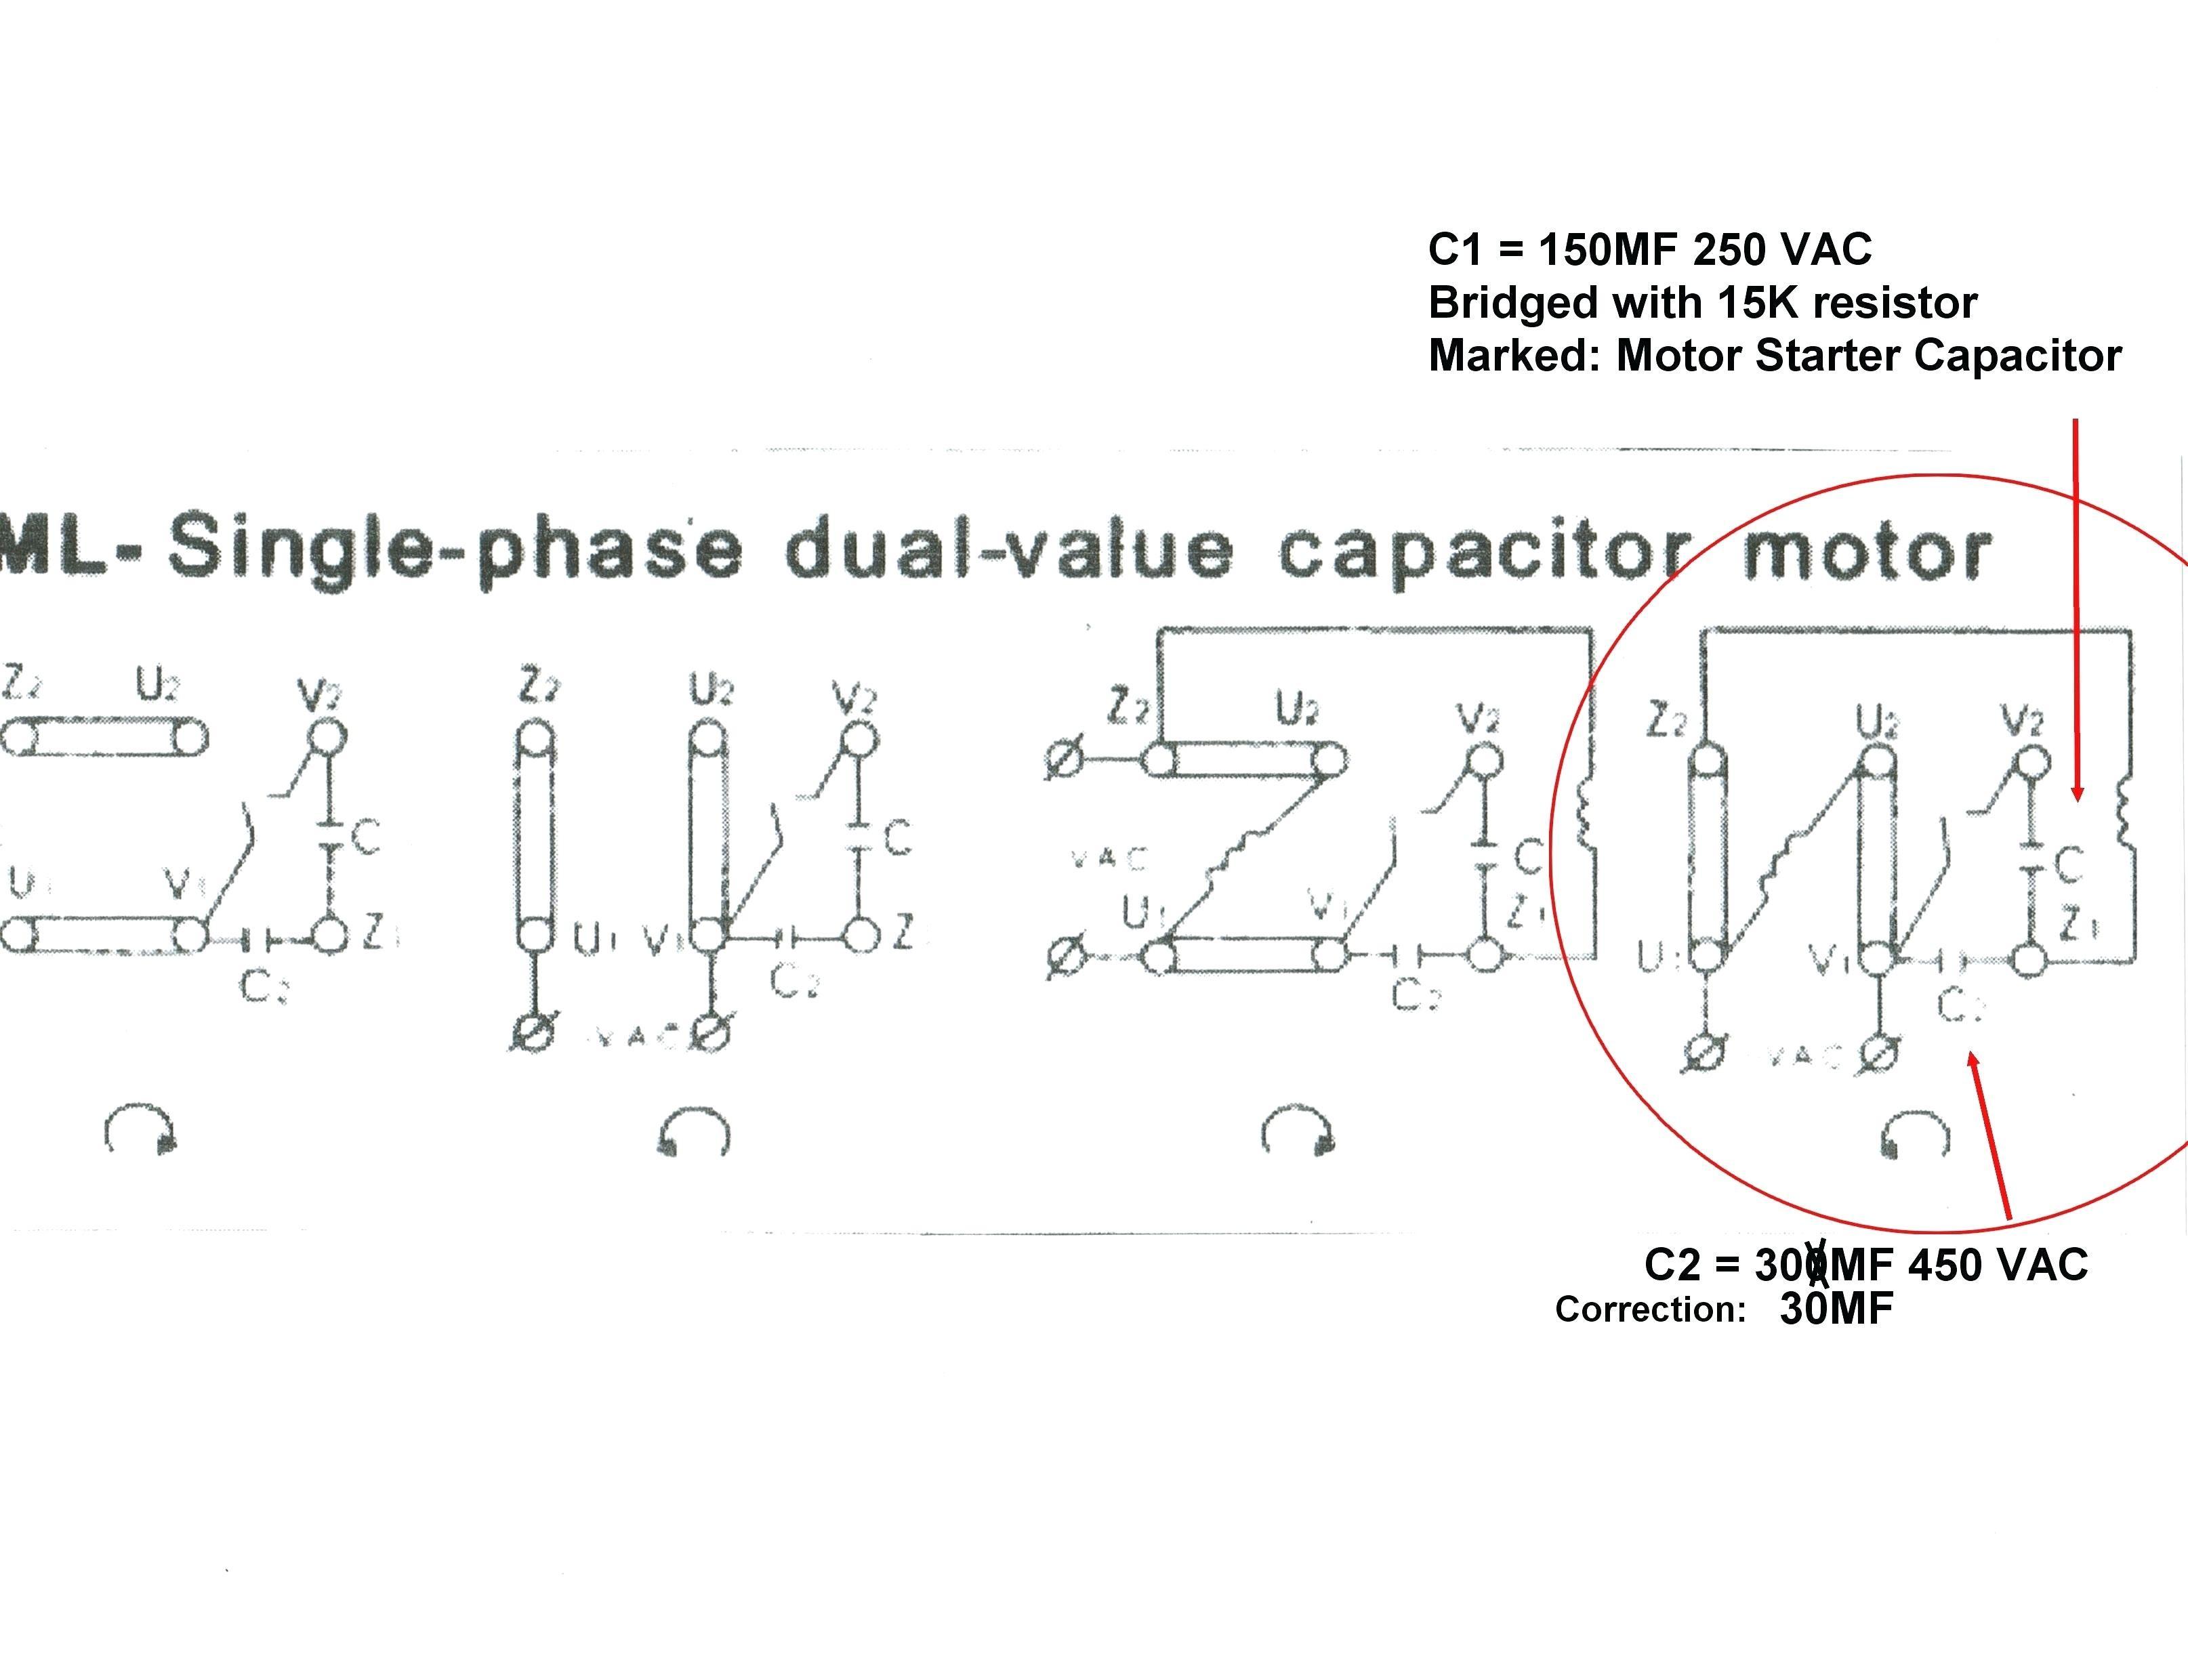 Wiring Diagram for Single Phase Motor Motor Wiring Diagram Baldor Single Phase This is A Picture Motors Of Wiring Diagram for Single Phase Motor